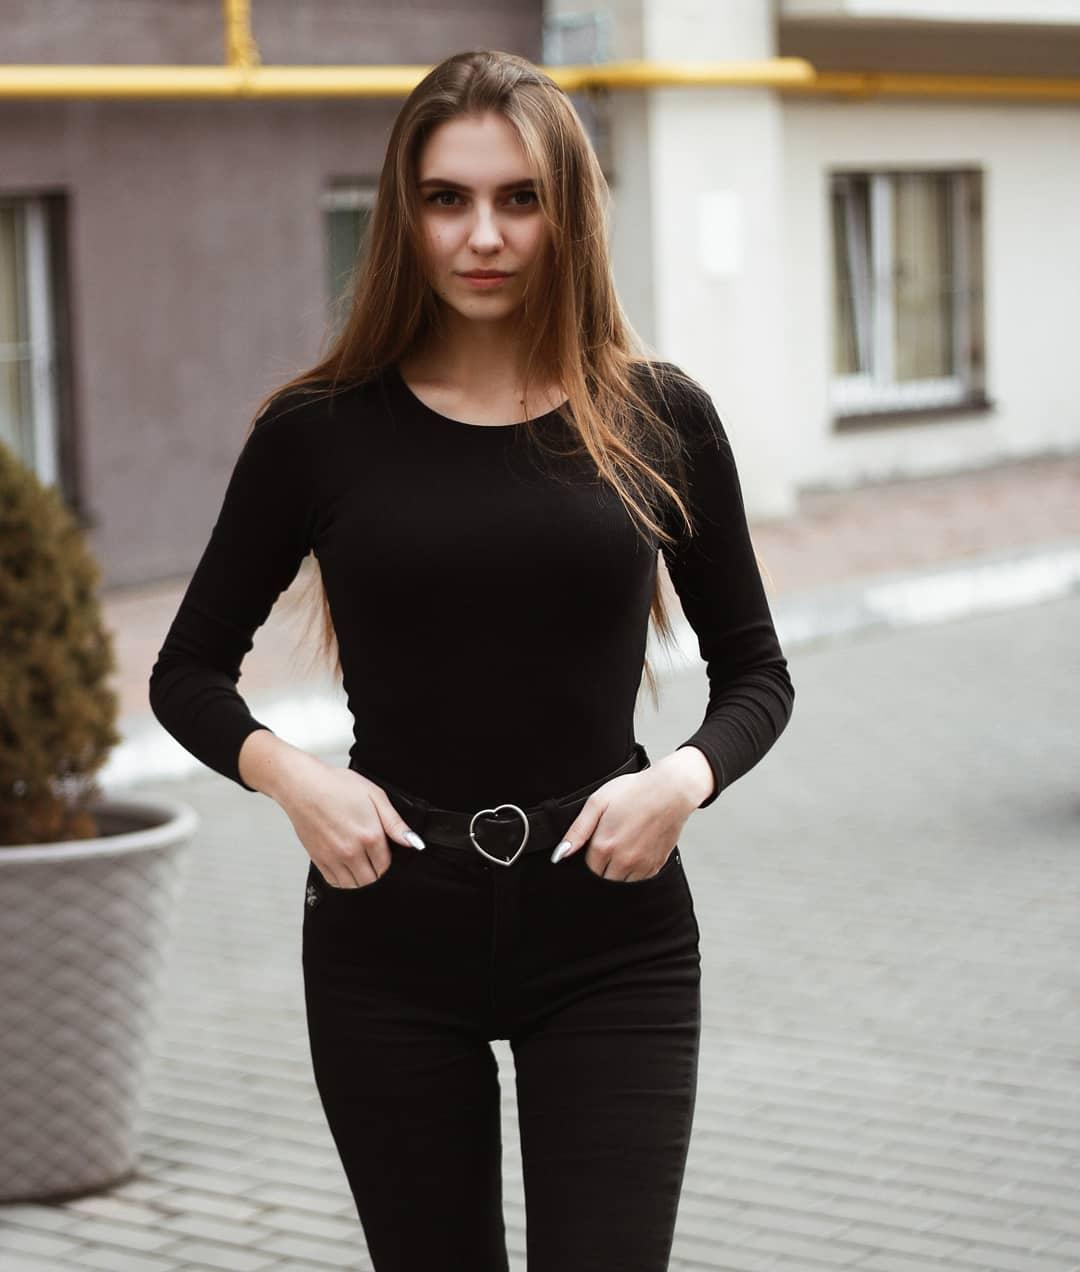 Katya-Melnyk-Wallpapers-Insta-Biography-5